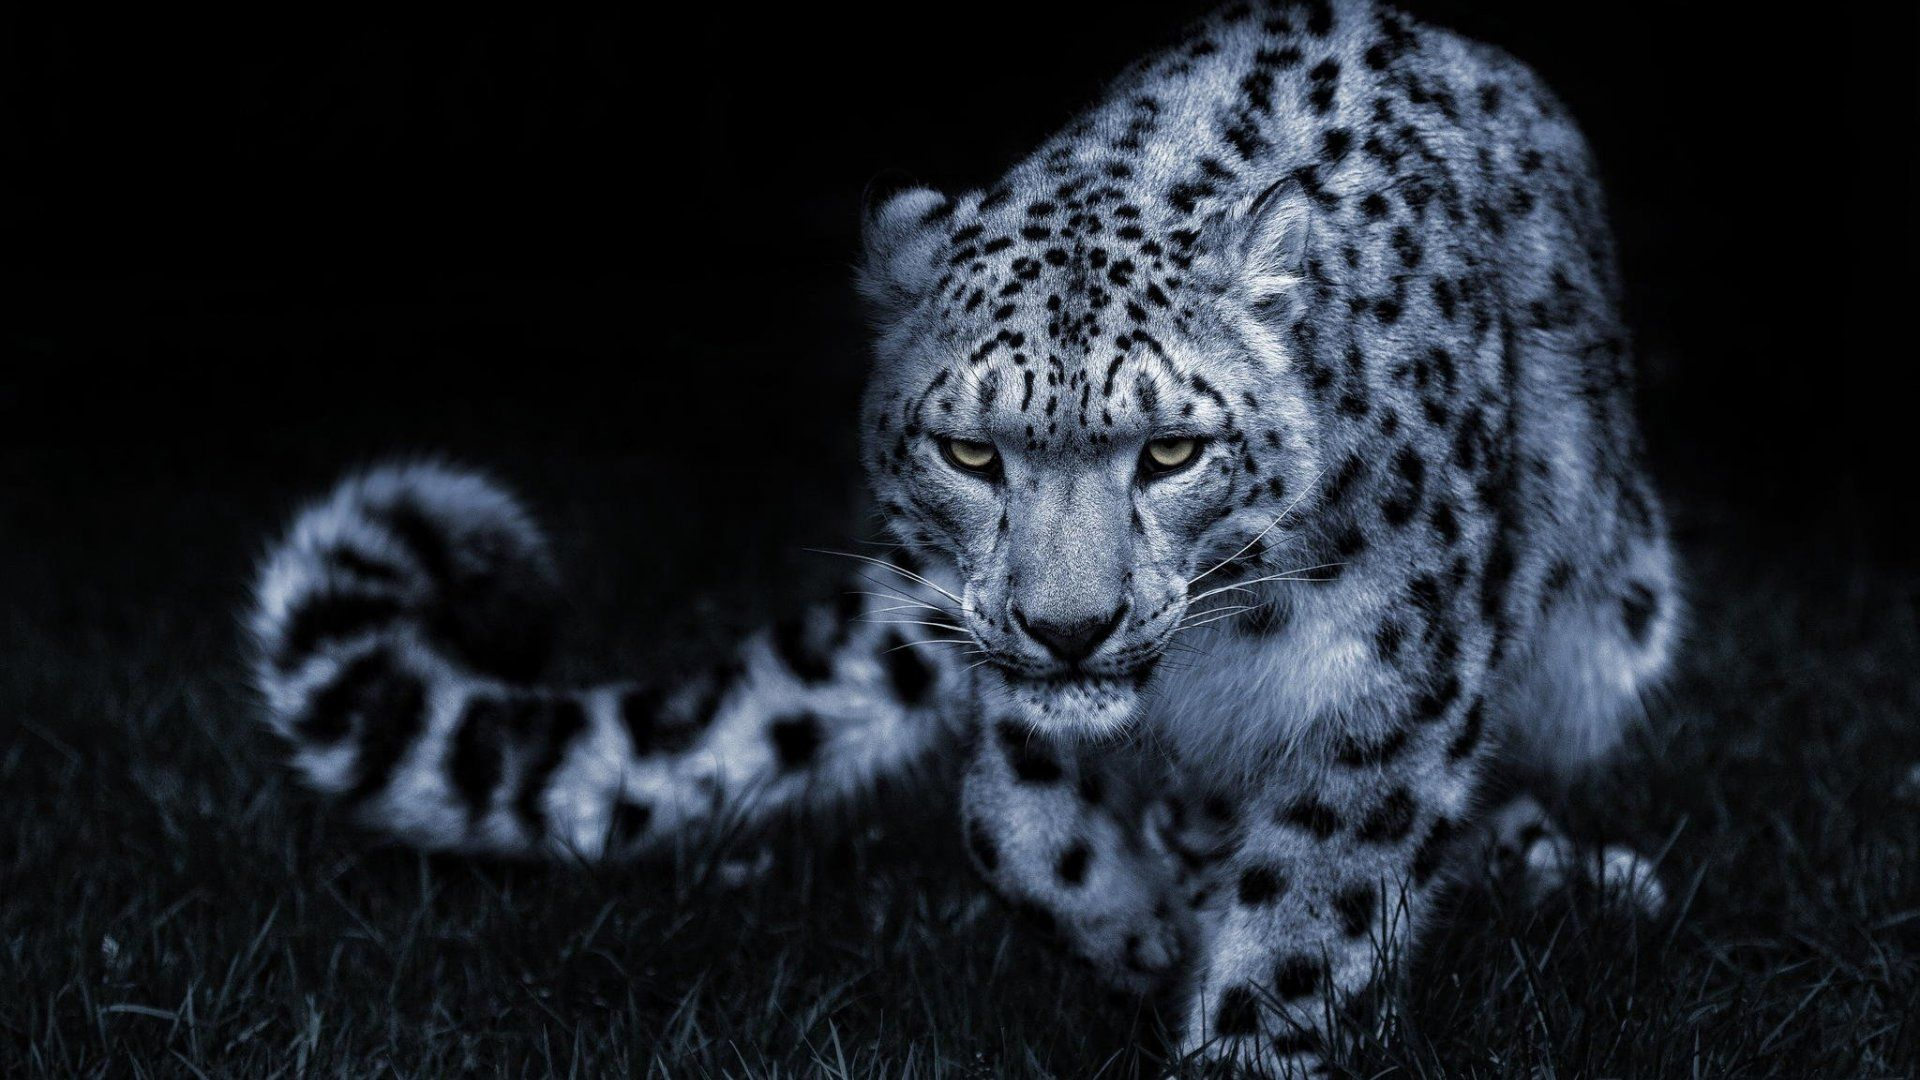 Amazing White Leopard 2020 Live Wallpaper Hd Snow Leopard Wallpaper Leopard Wallpaper Snow Leopard